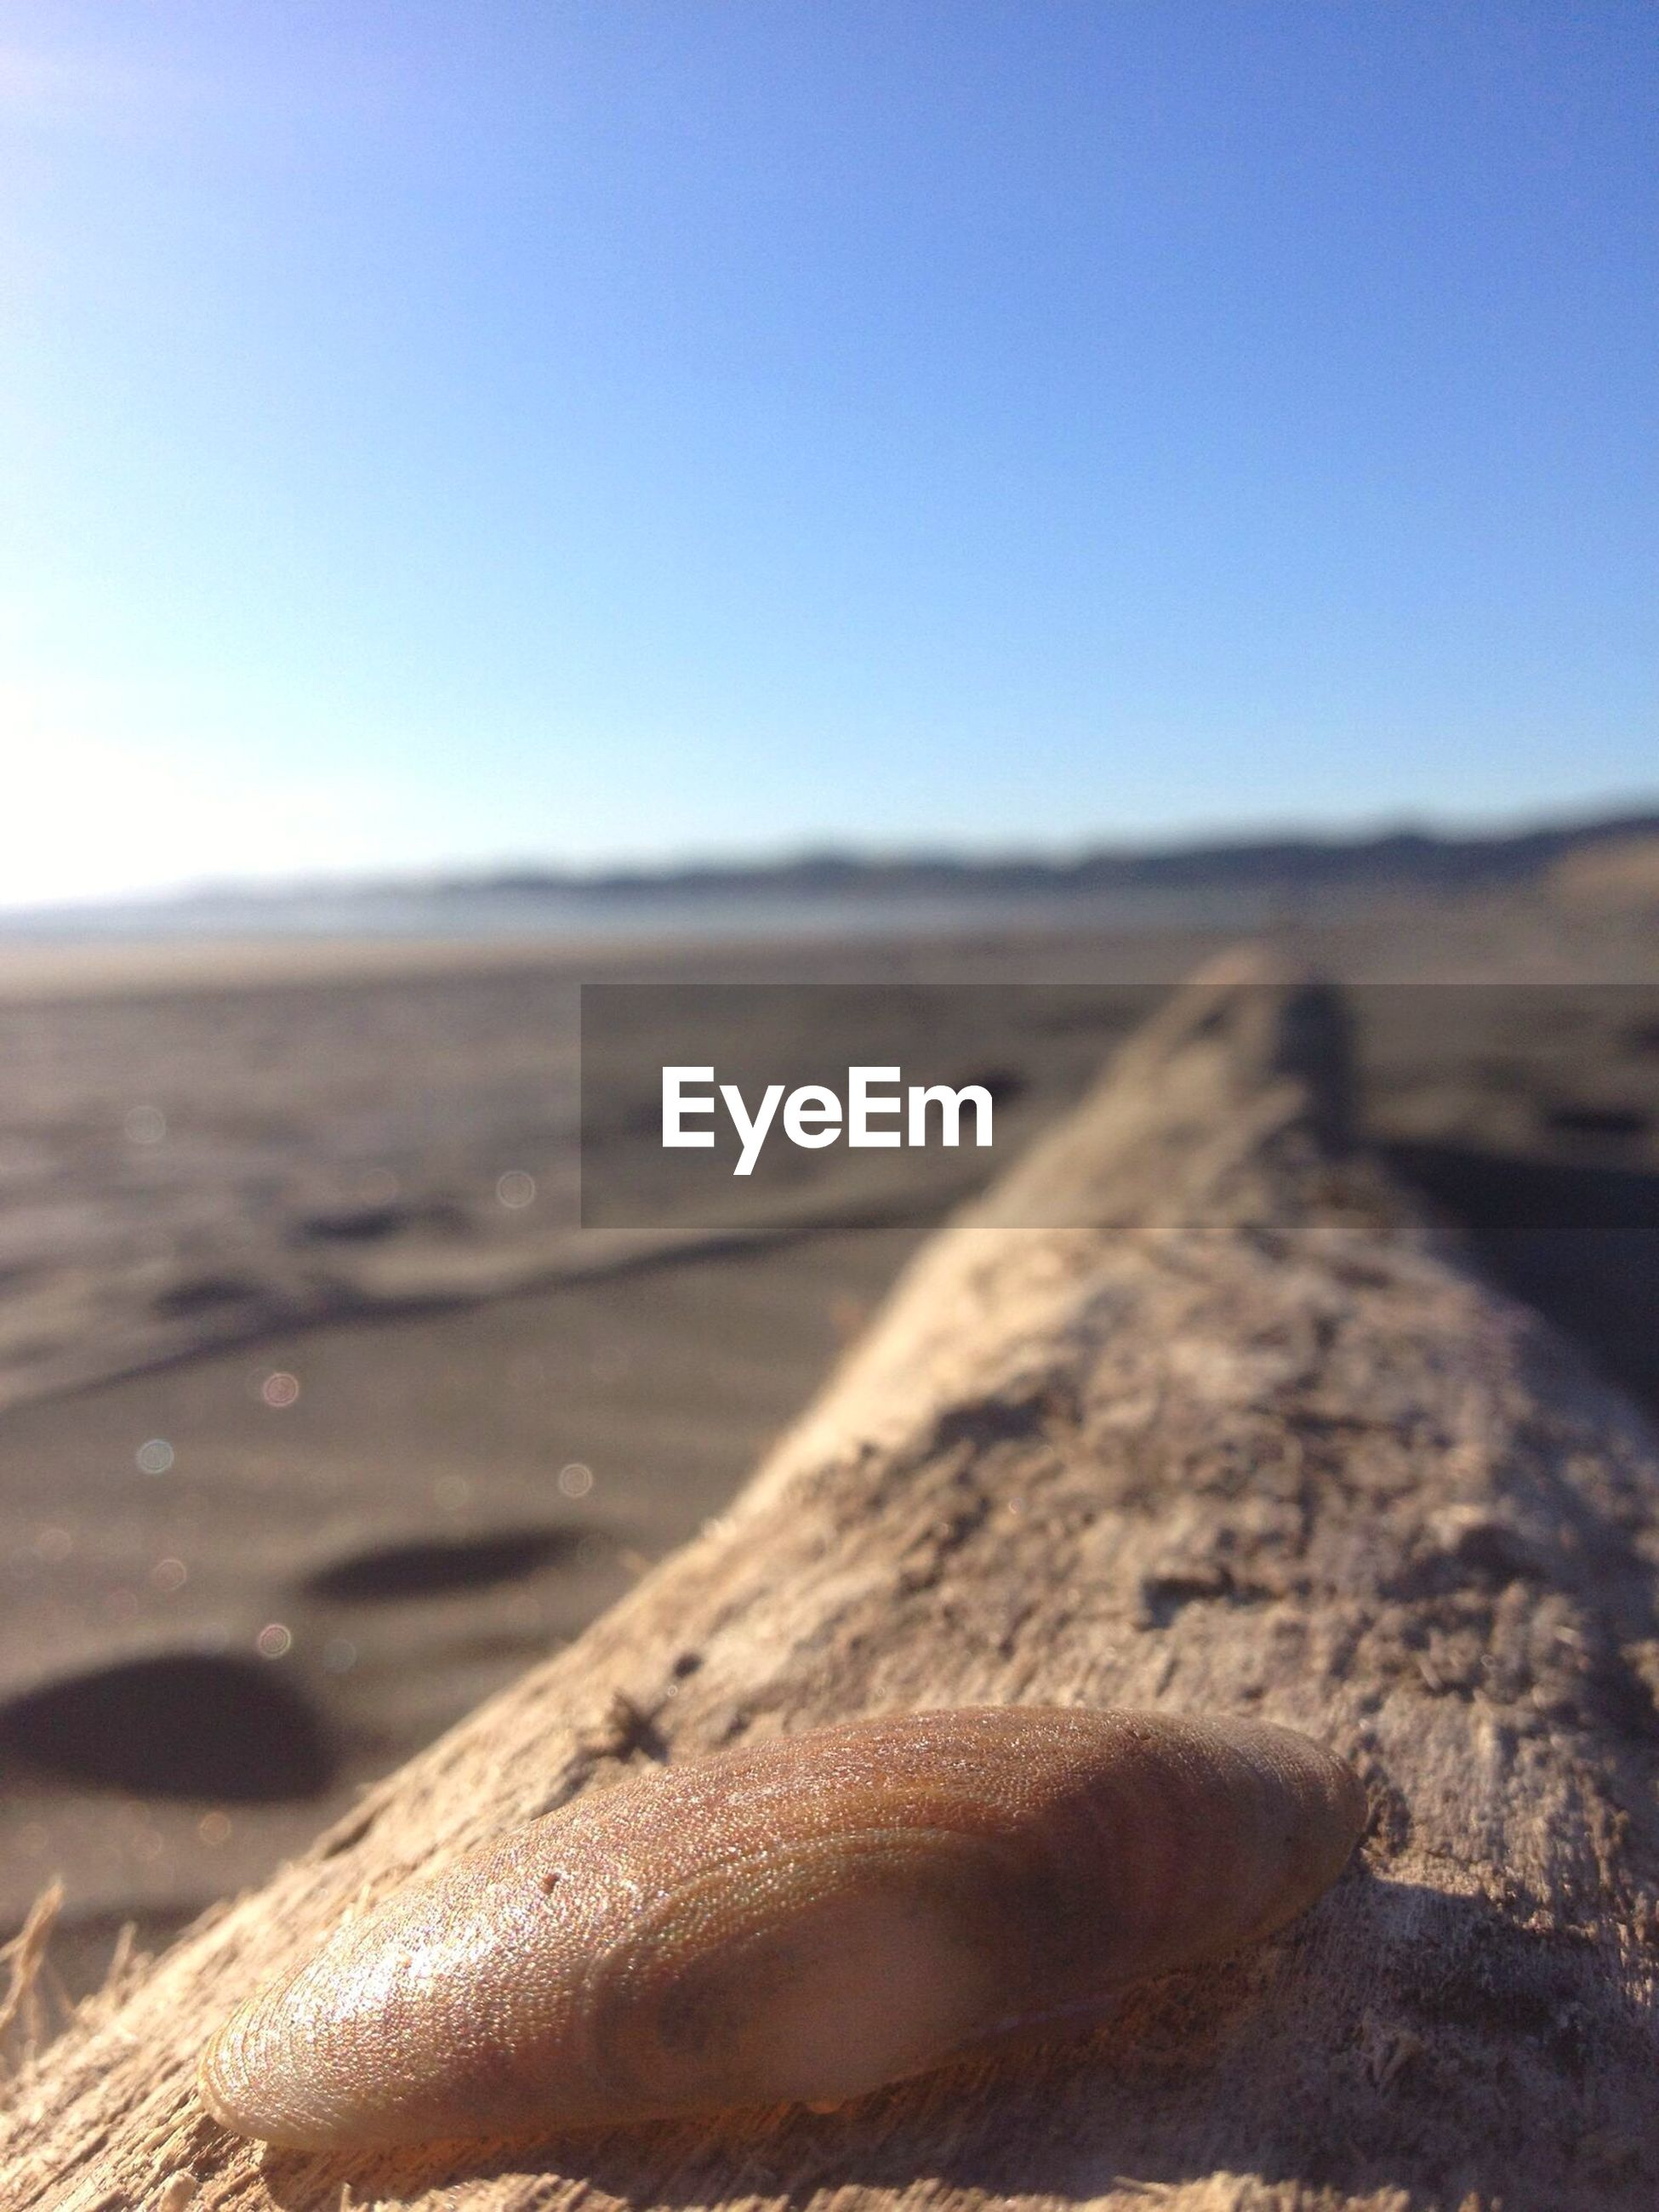 Seashell on wood at beach